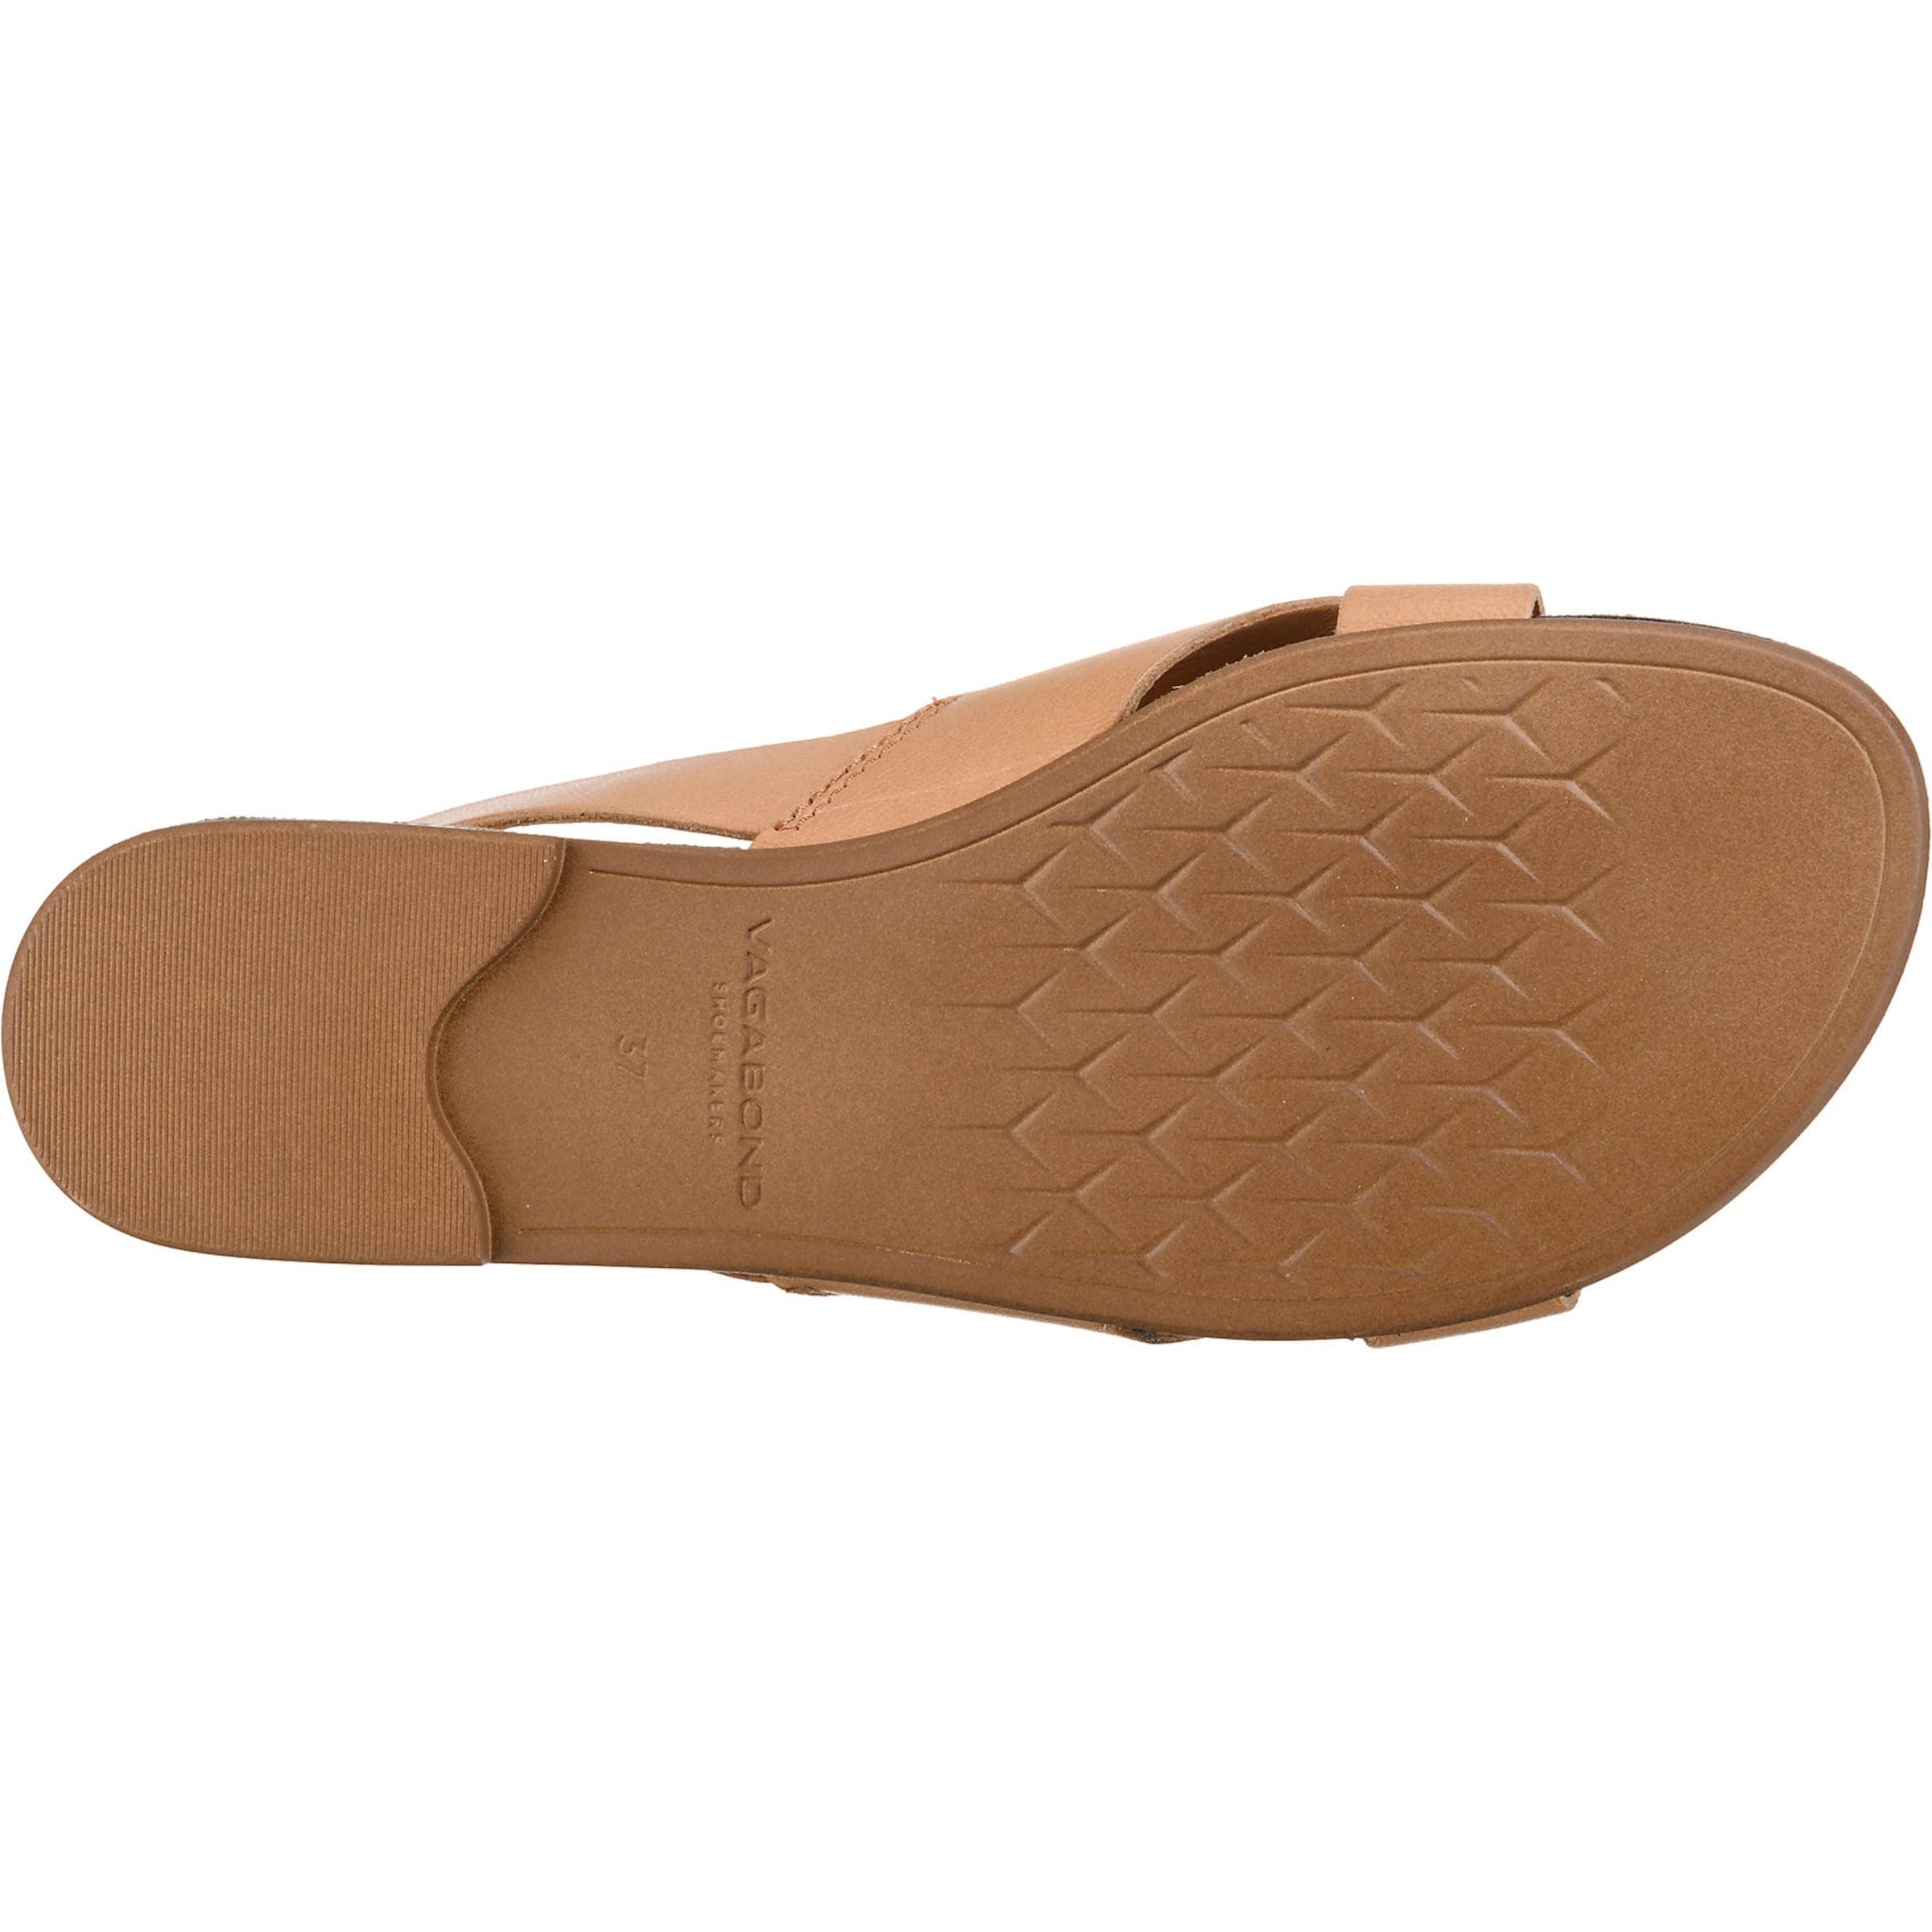 Shoemakers Vagabond In Hellbeige Vagabond Sandalen Hellbeige Sandalen In Shoemakers bf6y7g